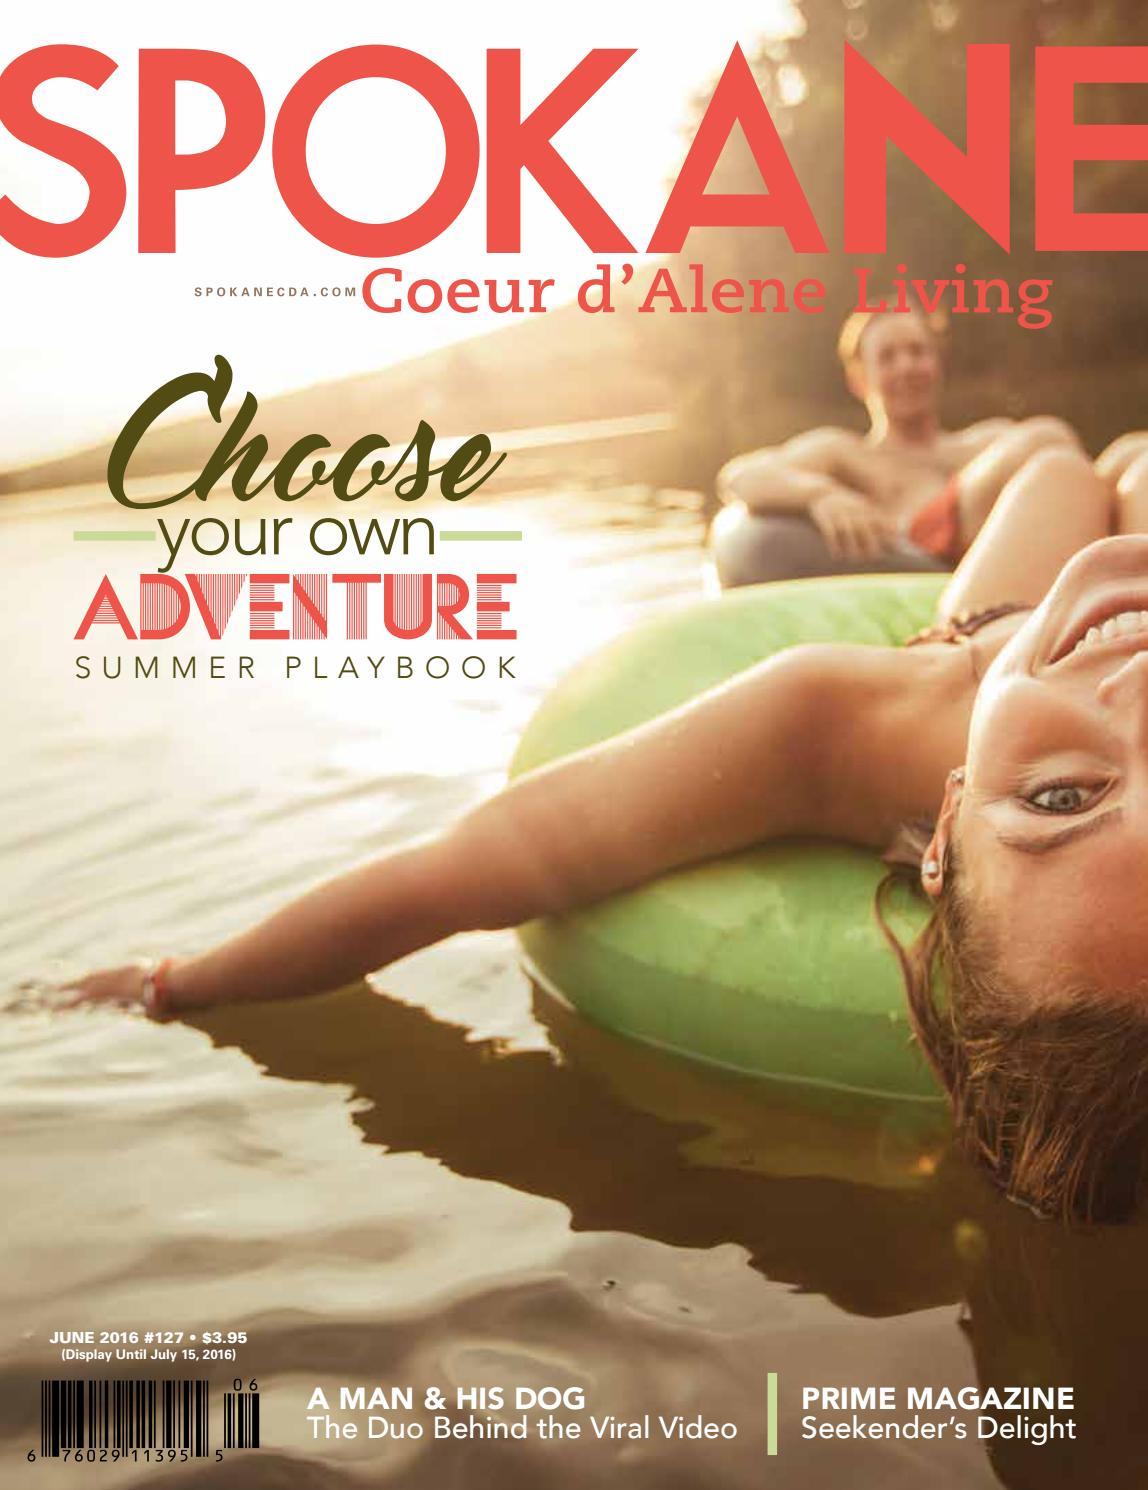 Spokane CDA Living June 2015 By Ksomday Issuu